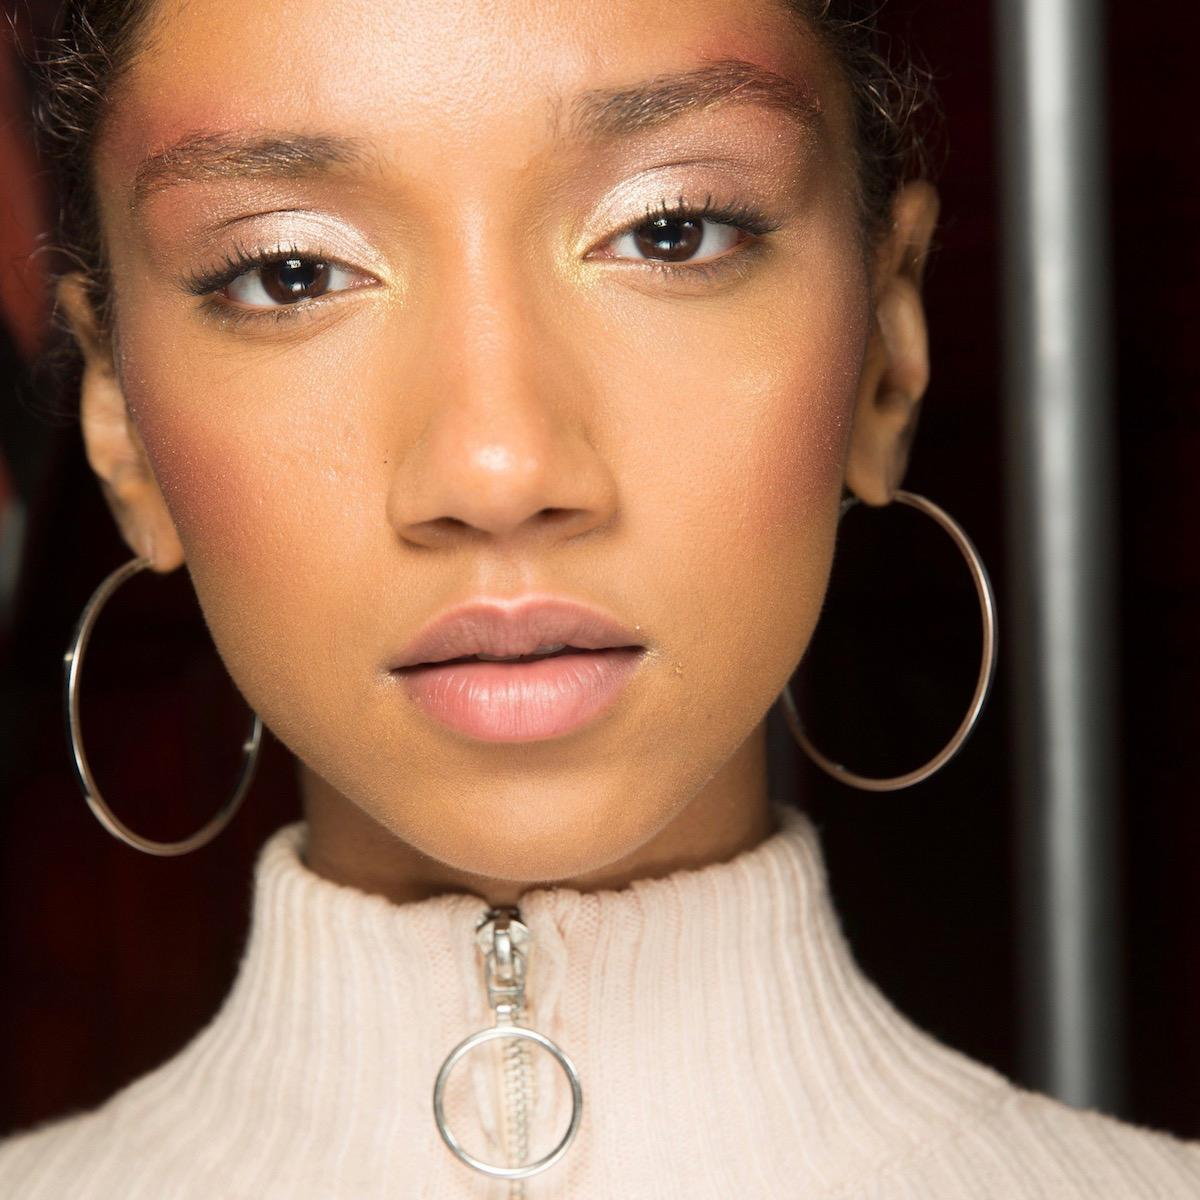 Lotique makeup trenden videz beautyfull blog rdečilo senčilo